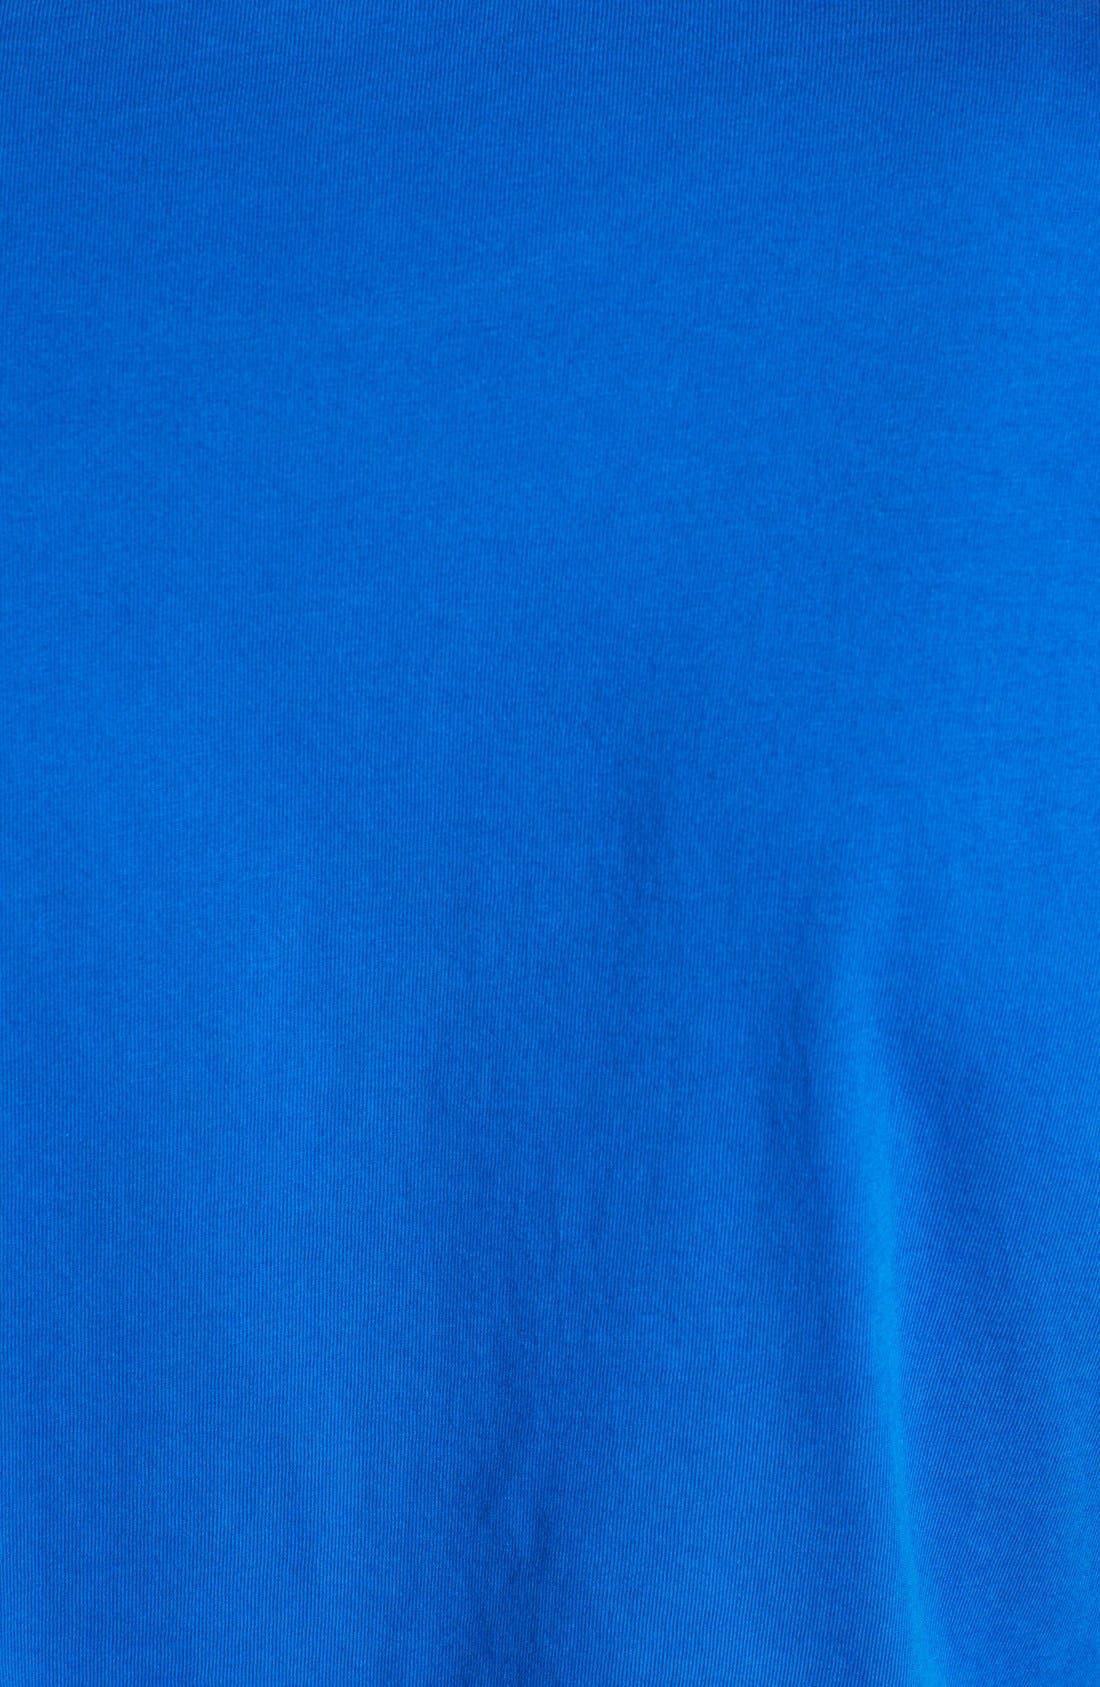 Alternate Image 3  - Junk Food 'New England Patriots - Kick Off' Graphic T-Shirt.